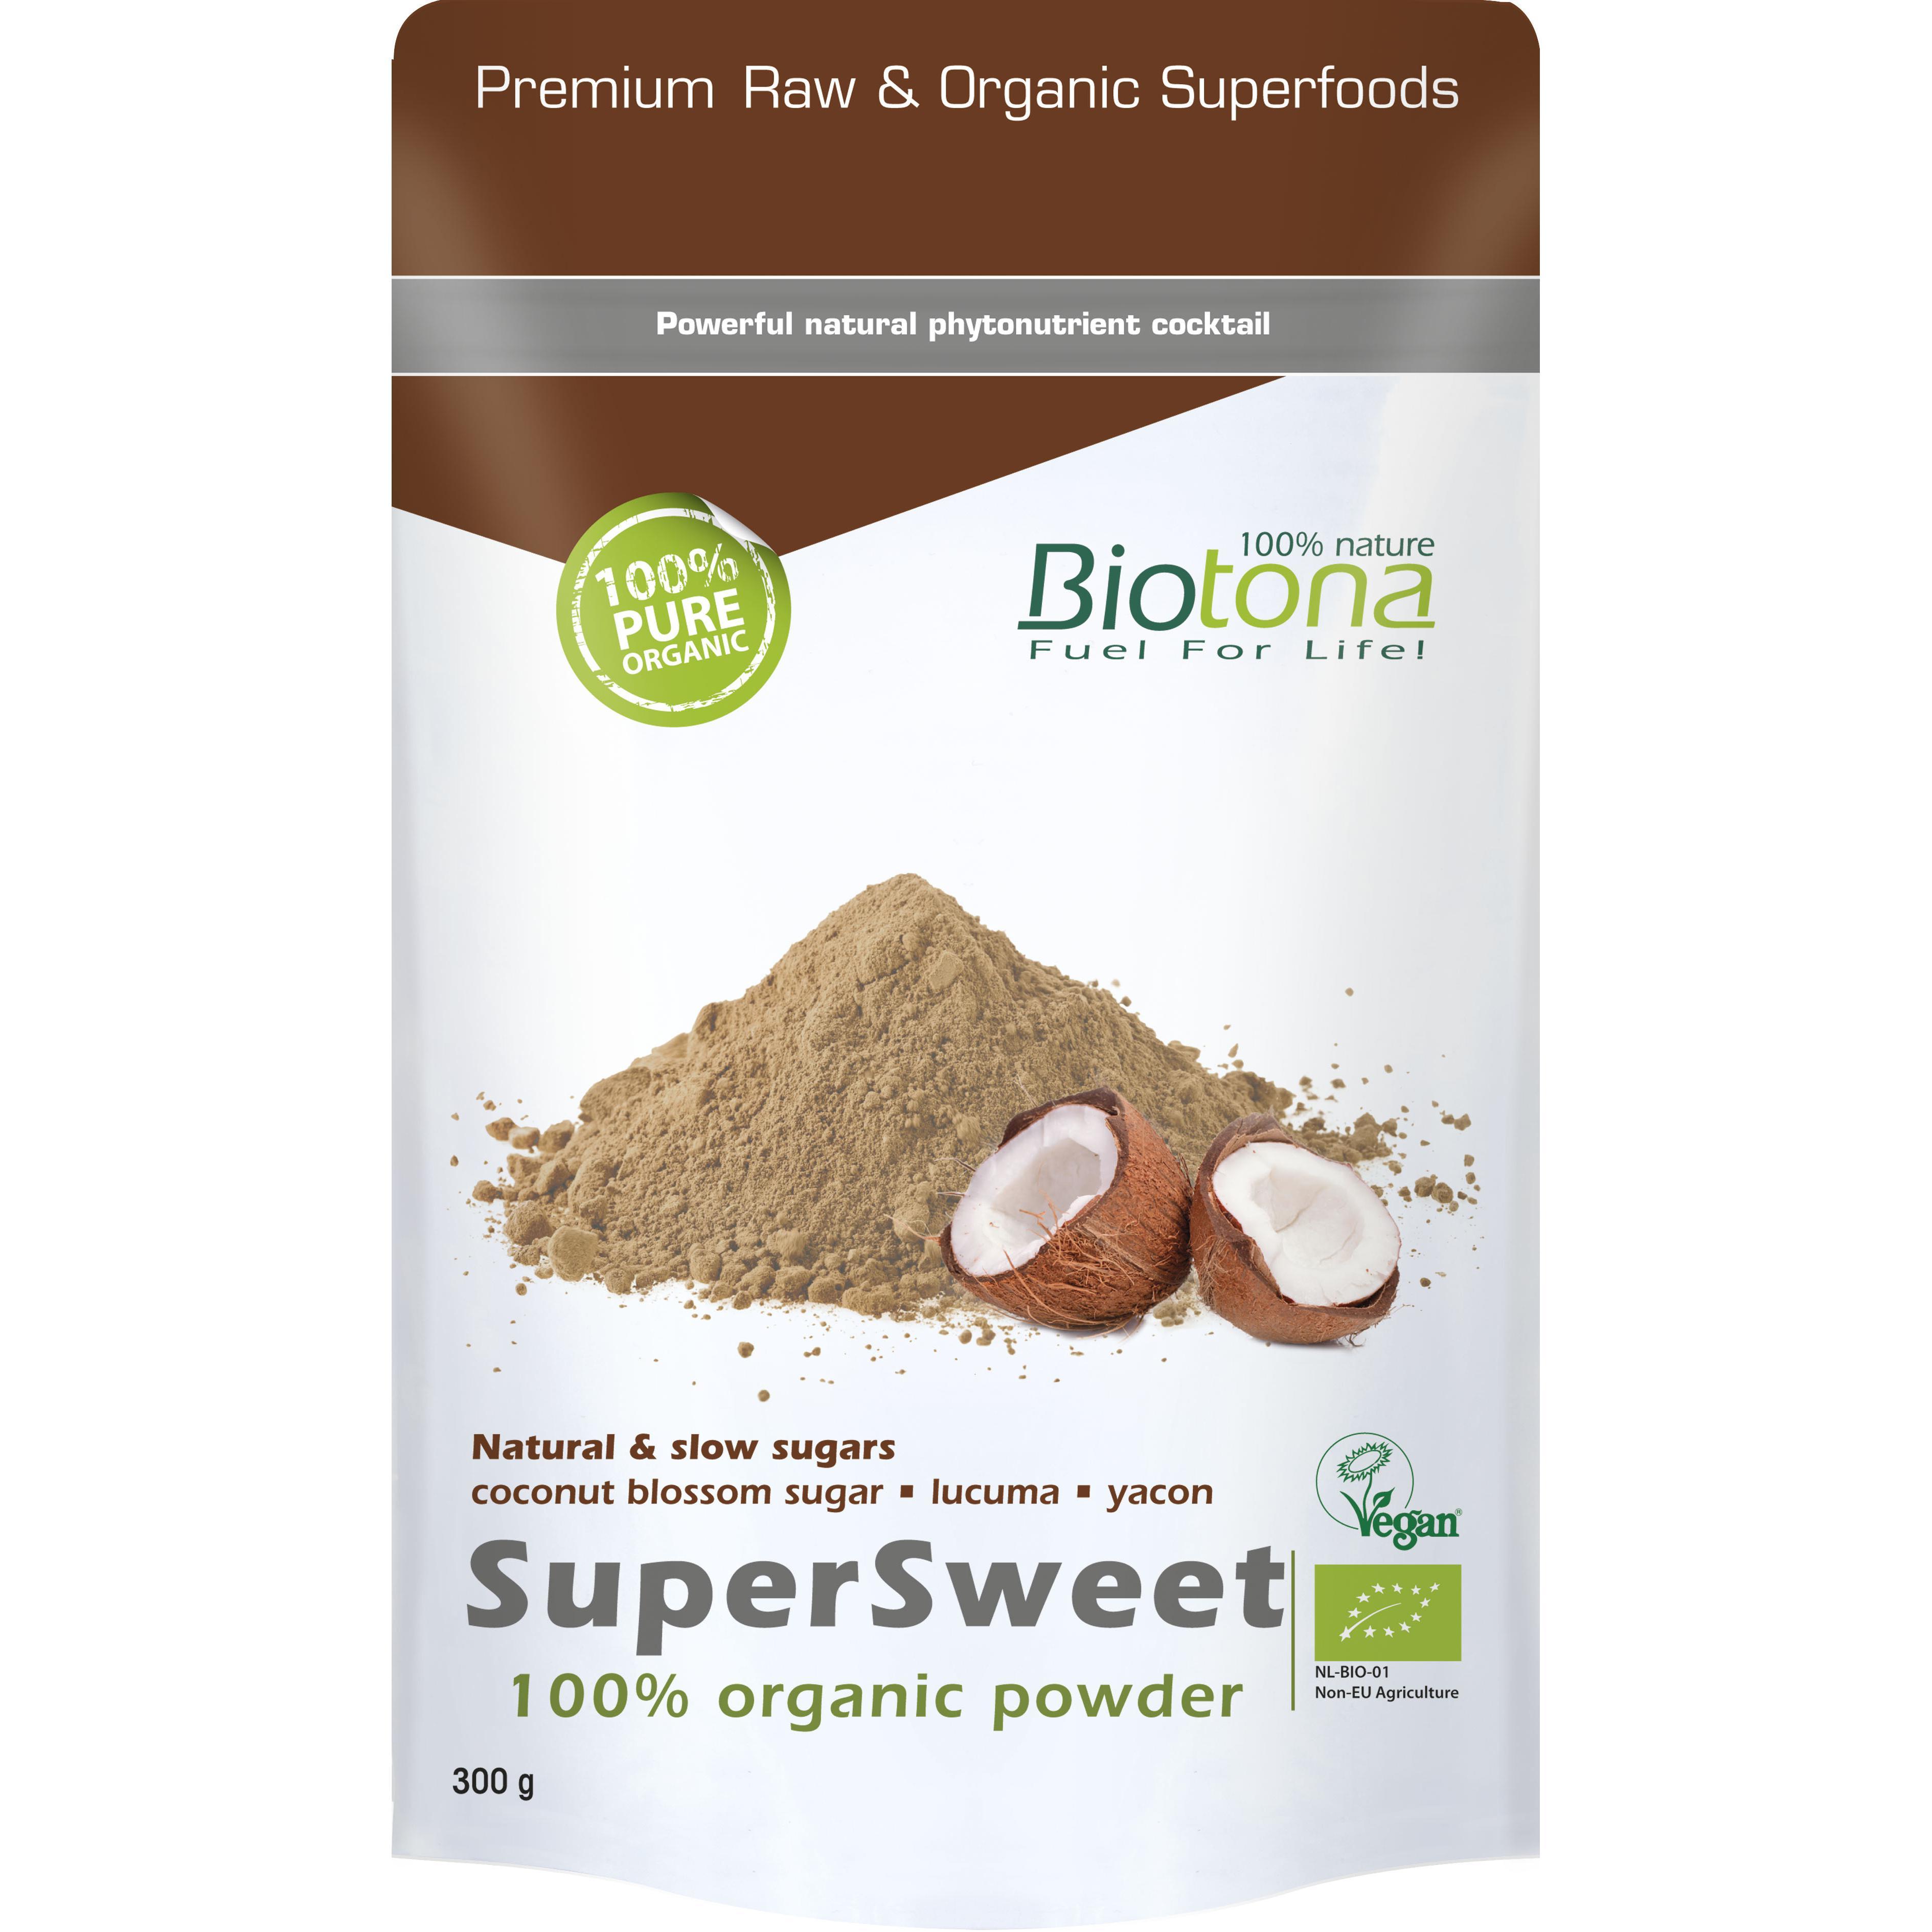 Biotona Supersweet organic